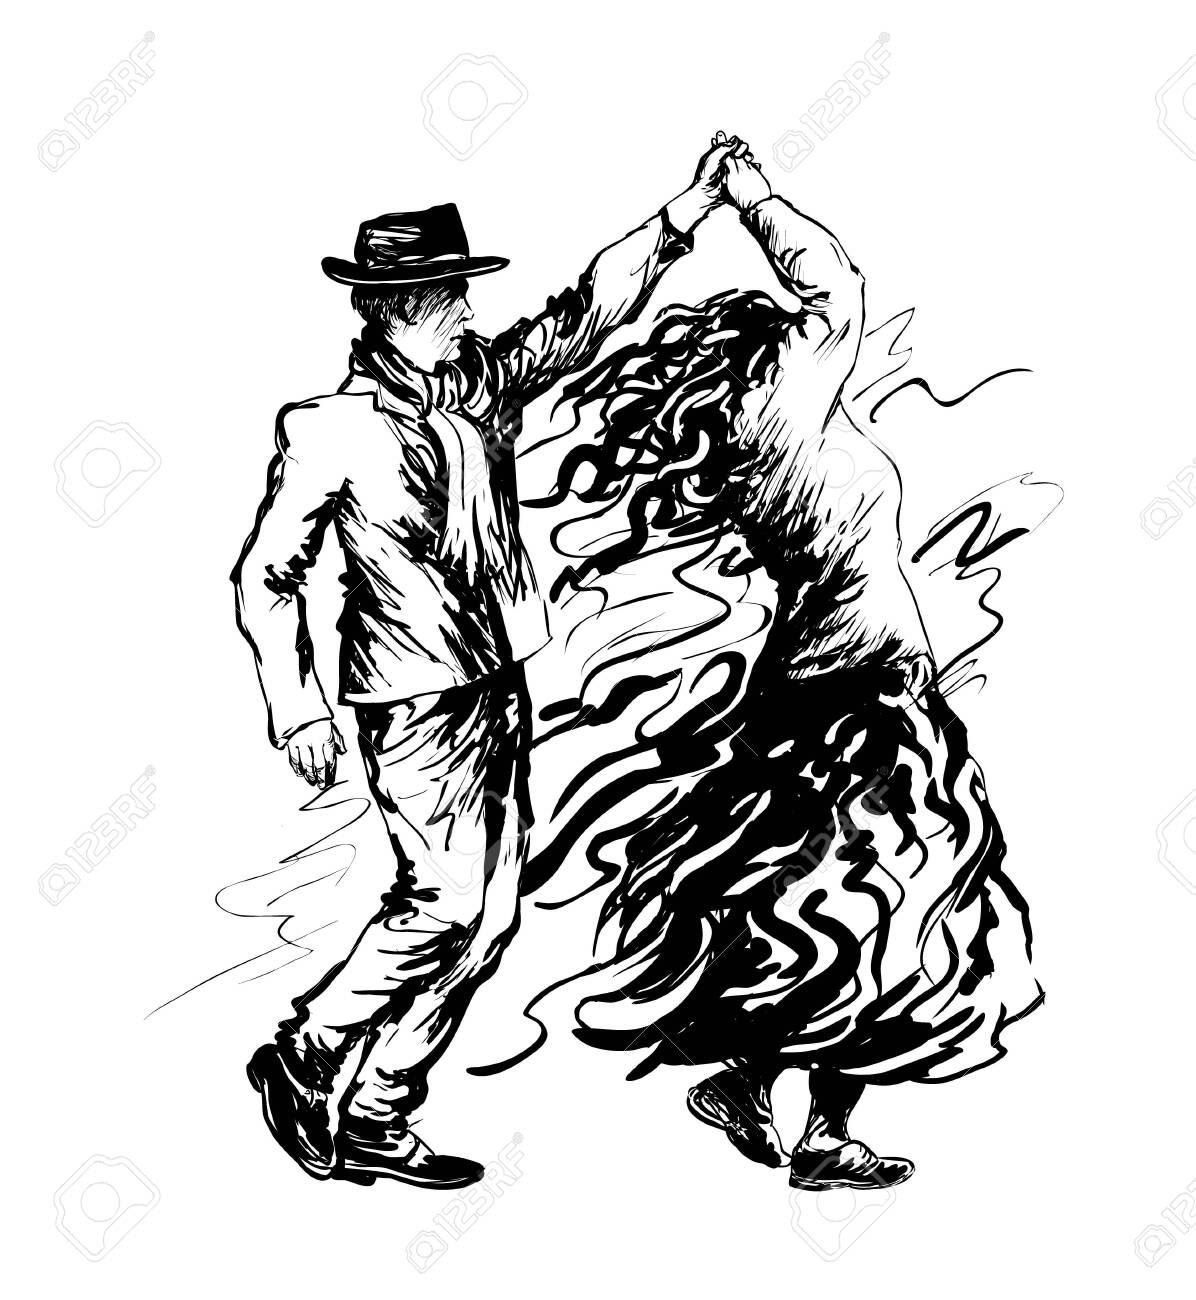 Couple of dancers, salsa dancing. Vector illustration - 137463075